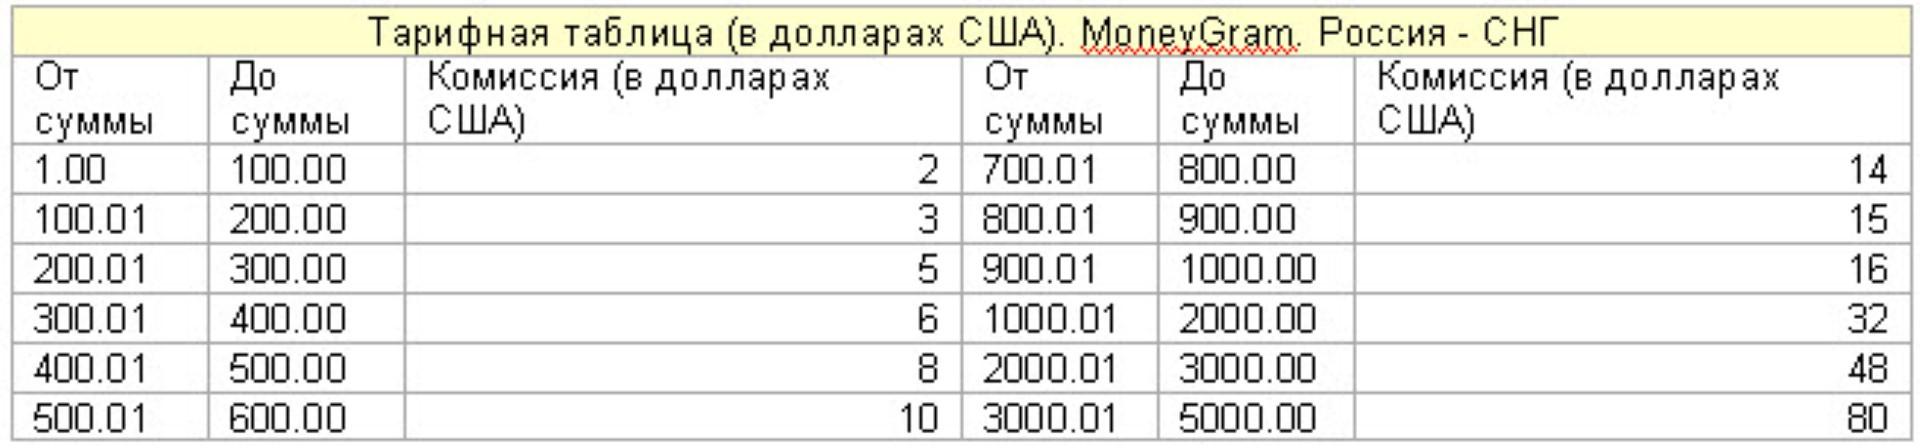 Моне грей перевод денег